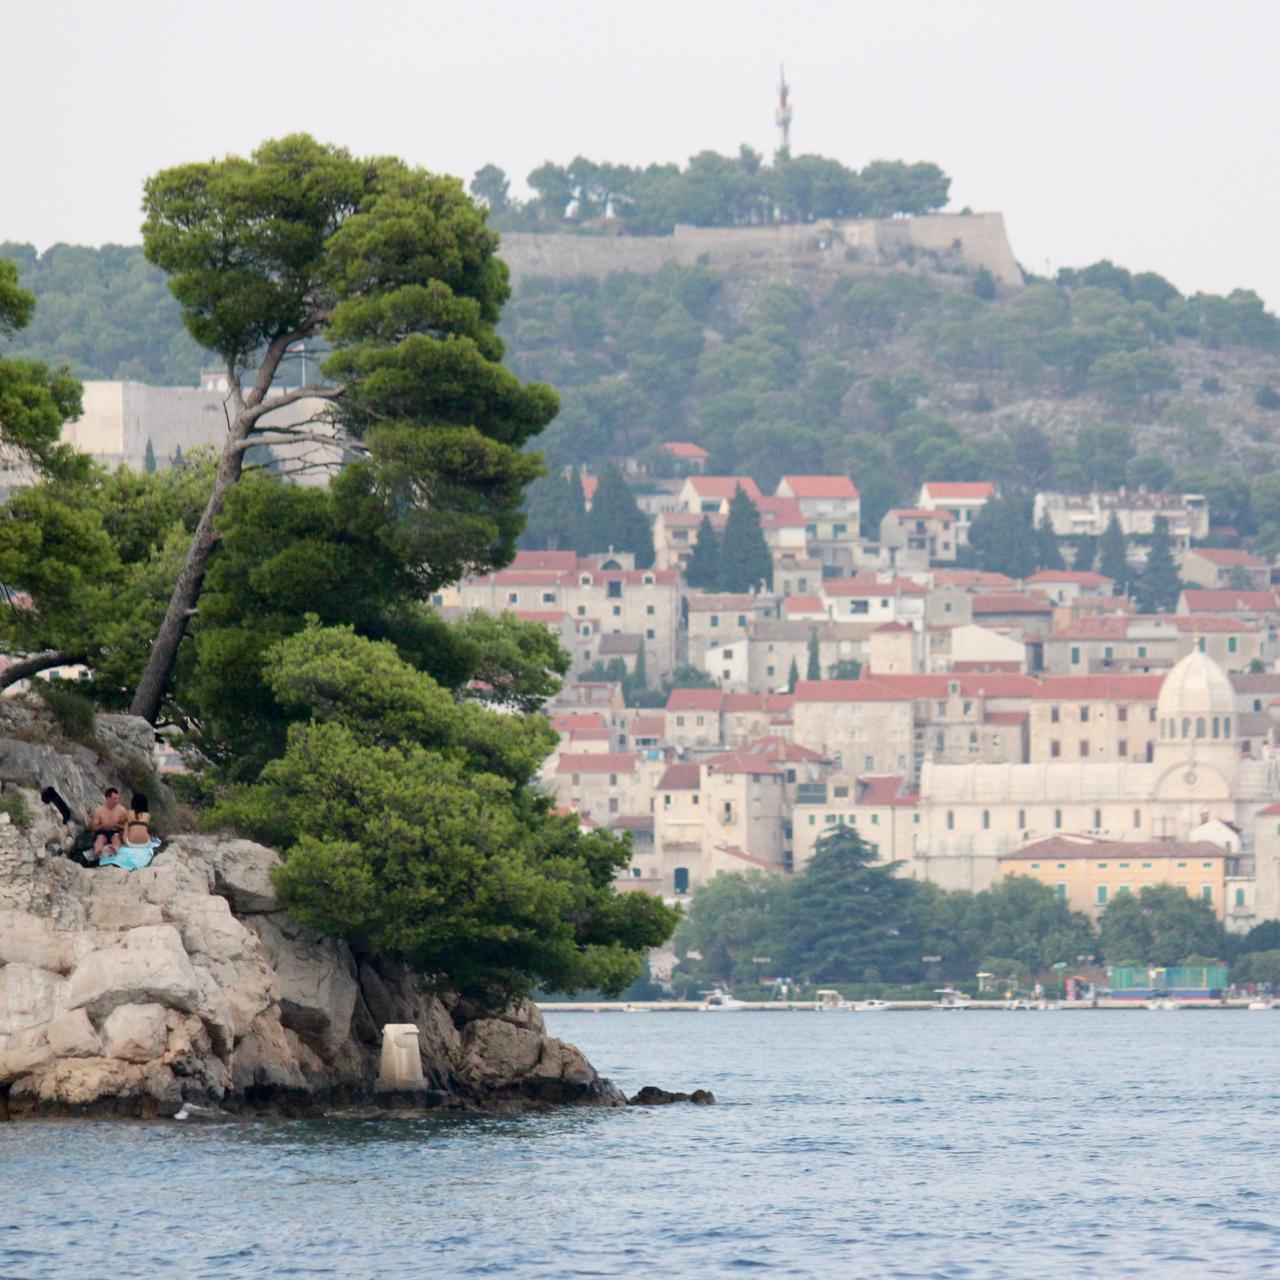 Šibenik, Croatia - 19